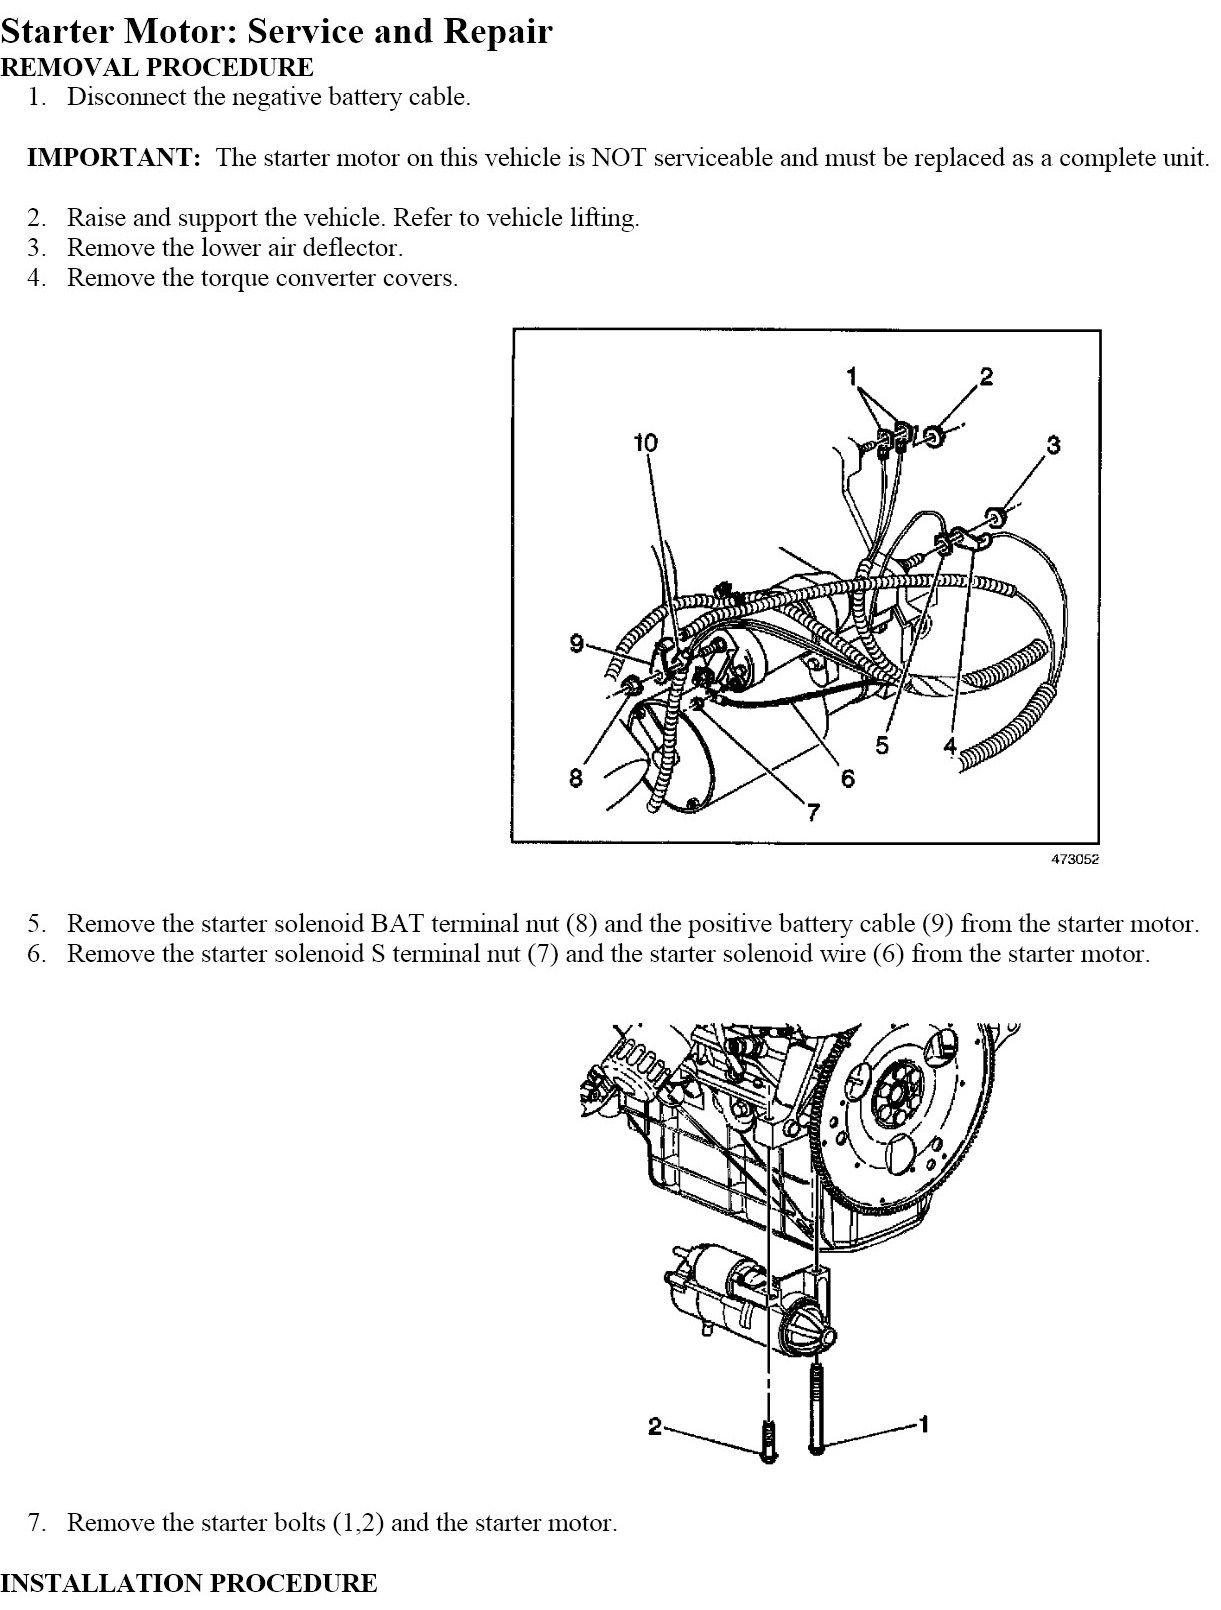 44 Best Of 2004 Chevy Impala Starter Wiring Diagram in ...